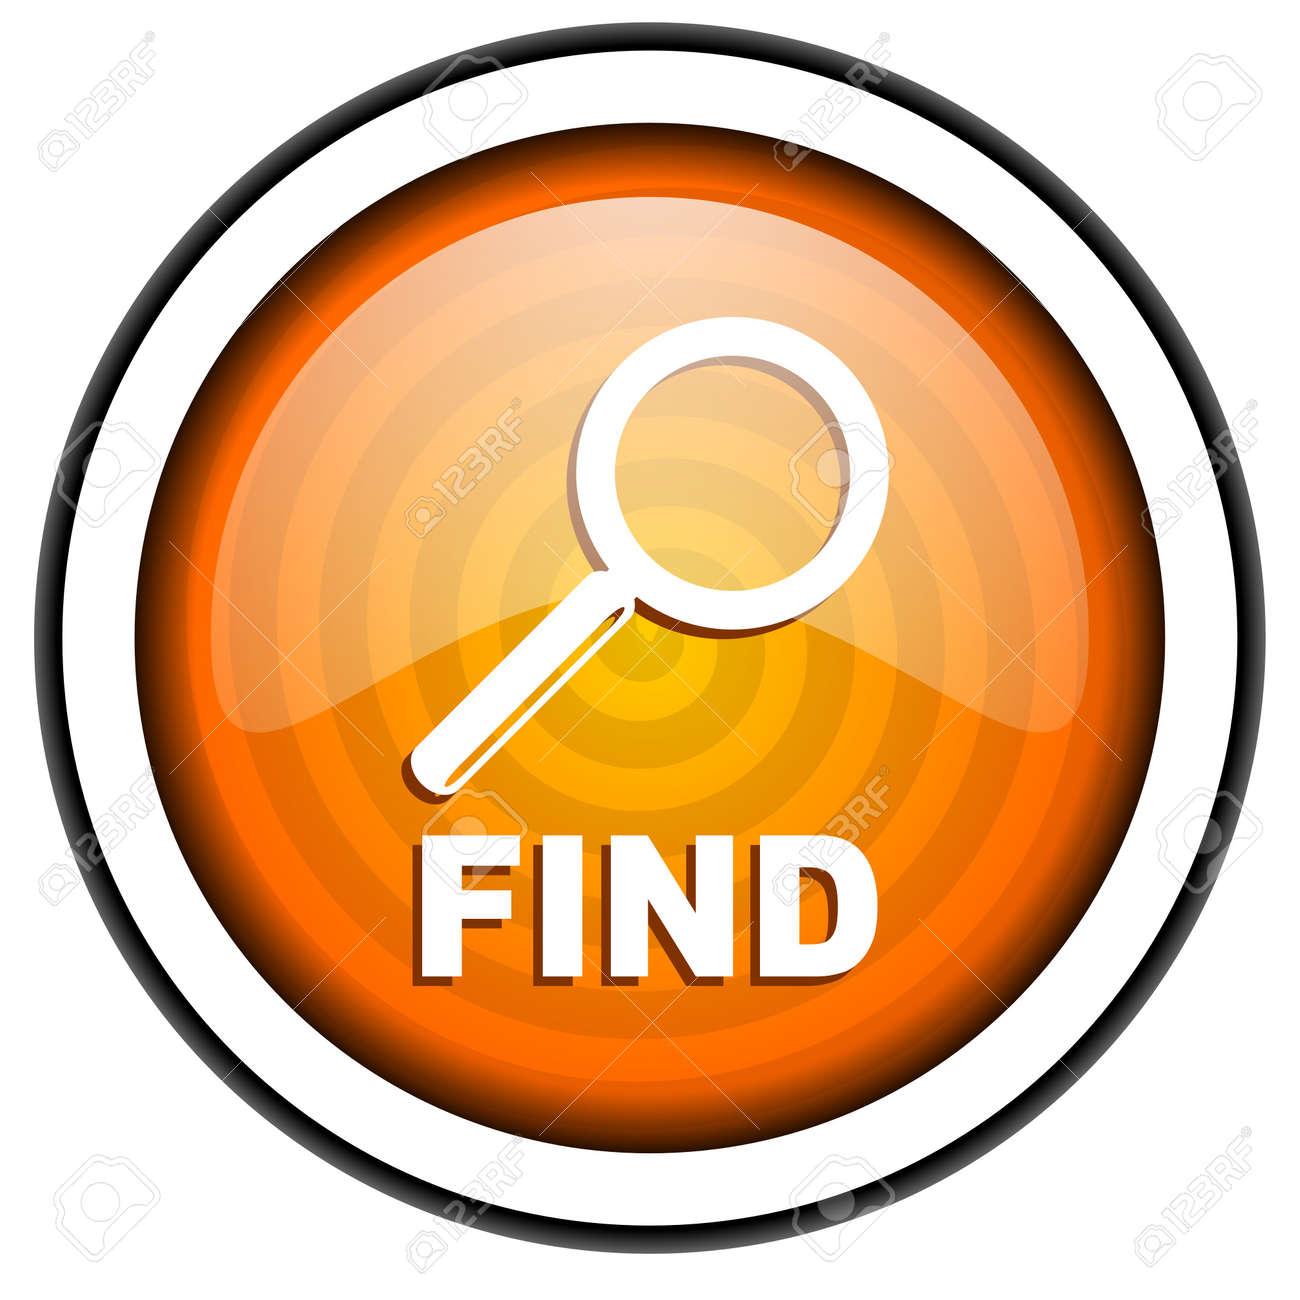 find orange glossy icon isolated on white background Stock Photo - 17067128